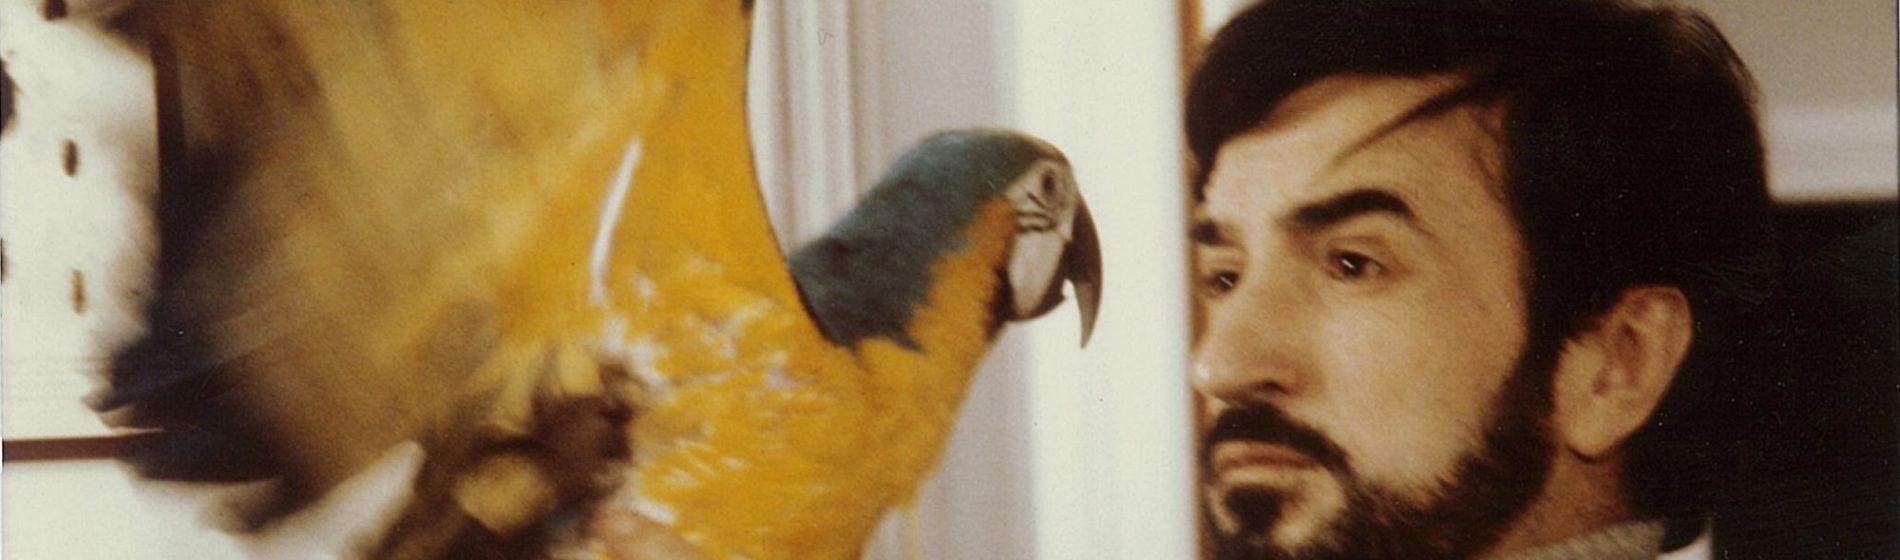 Jean-Claude Carrière with parrot